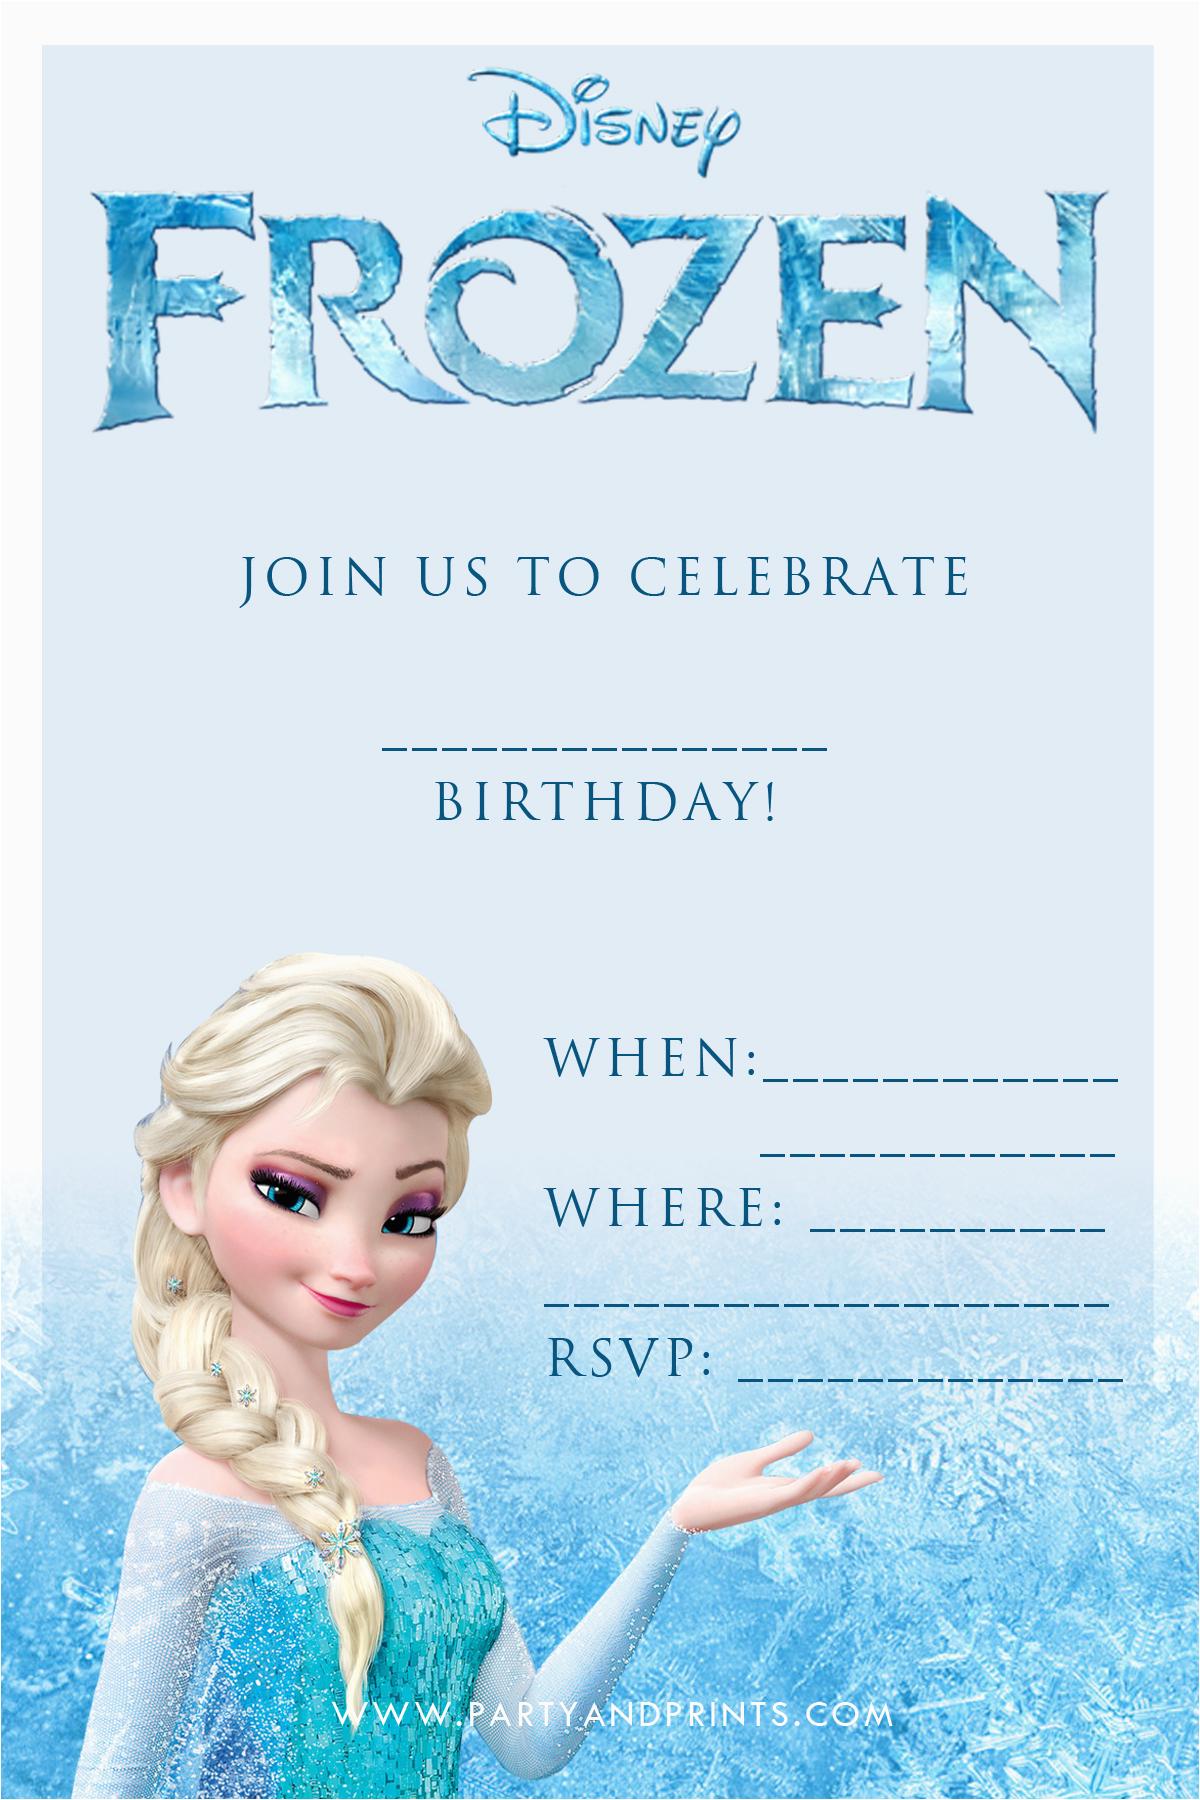 Frozen Themed Birthday Invitation Cards 20 Frozen Birthday Party